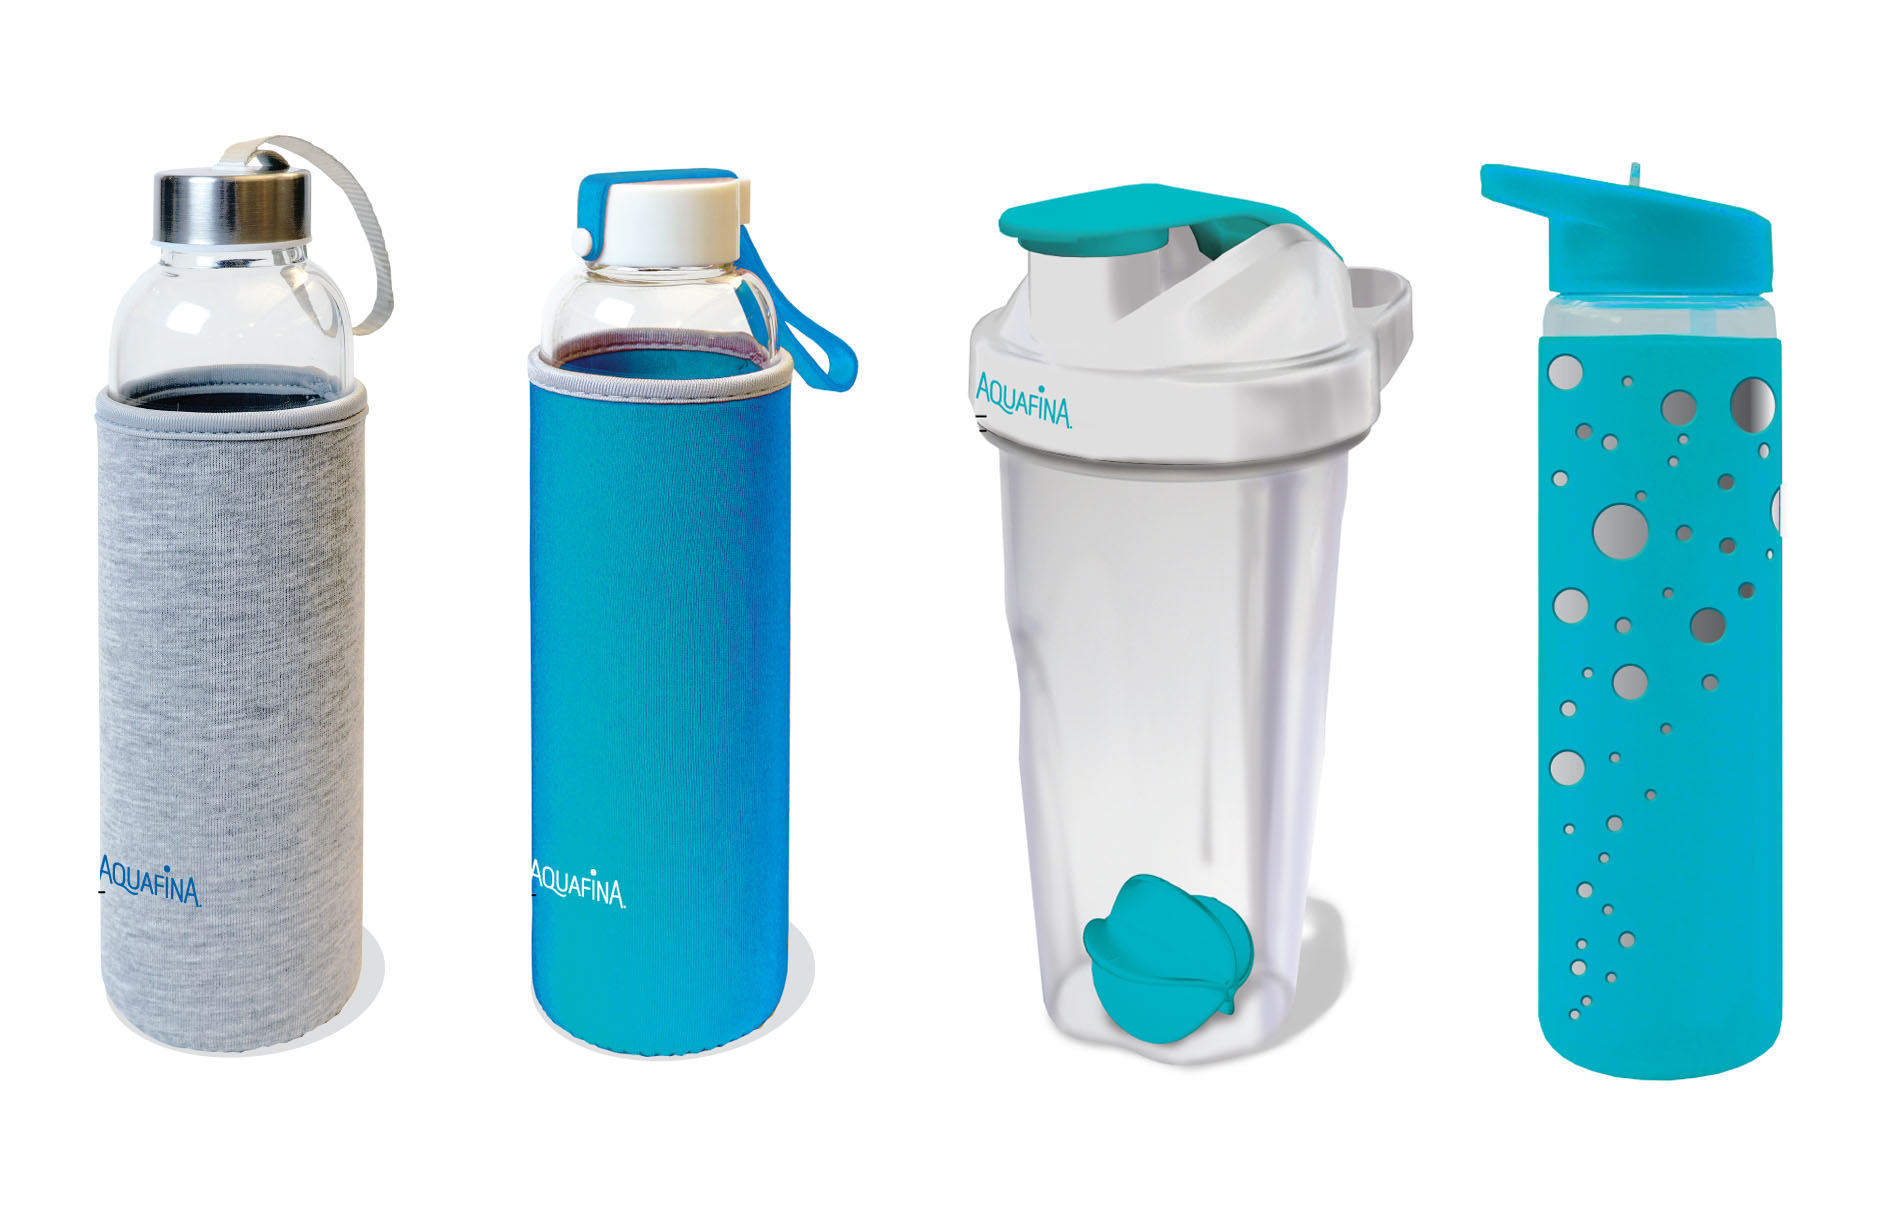 Aquafina Brand Licensing